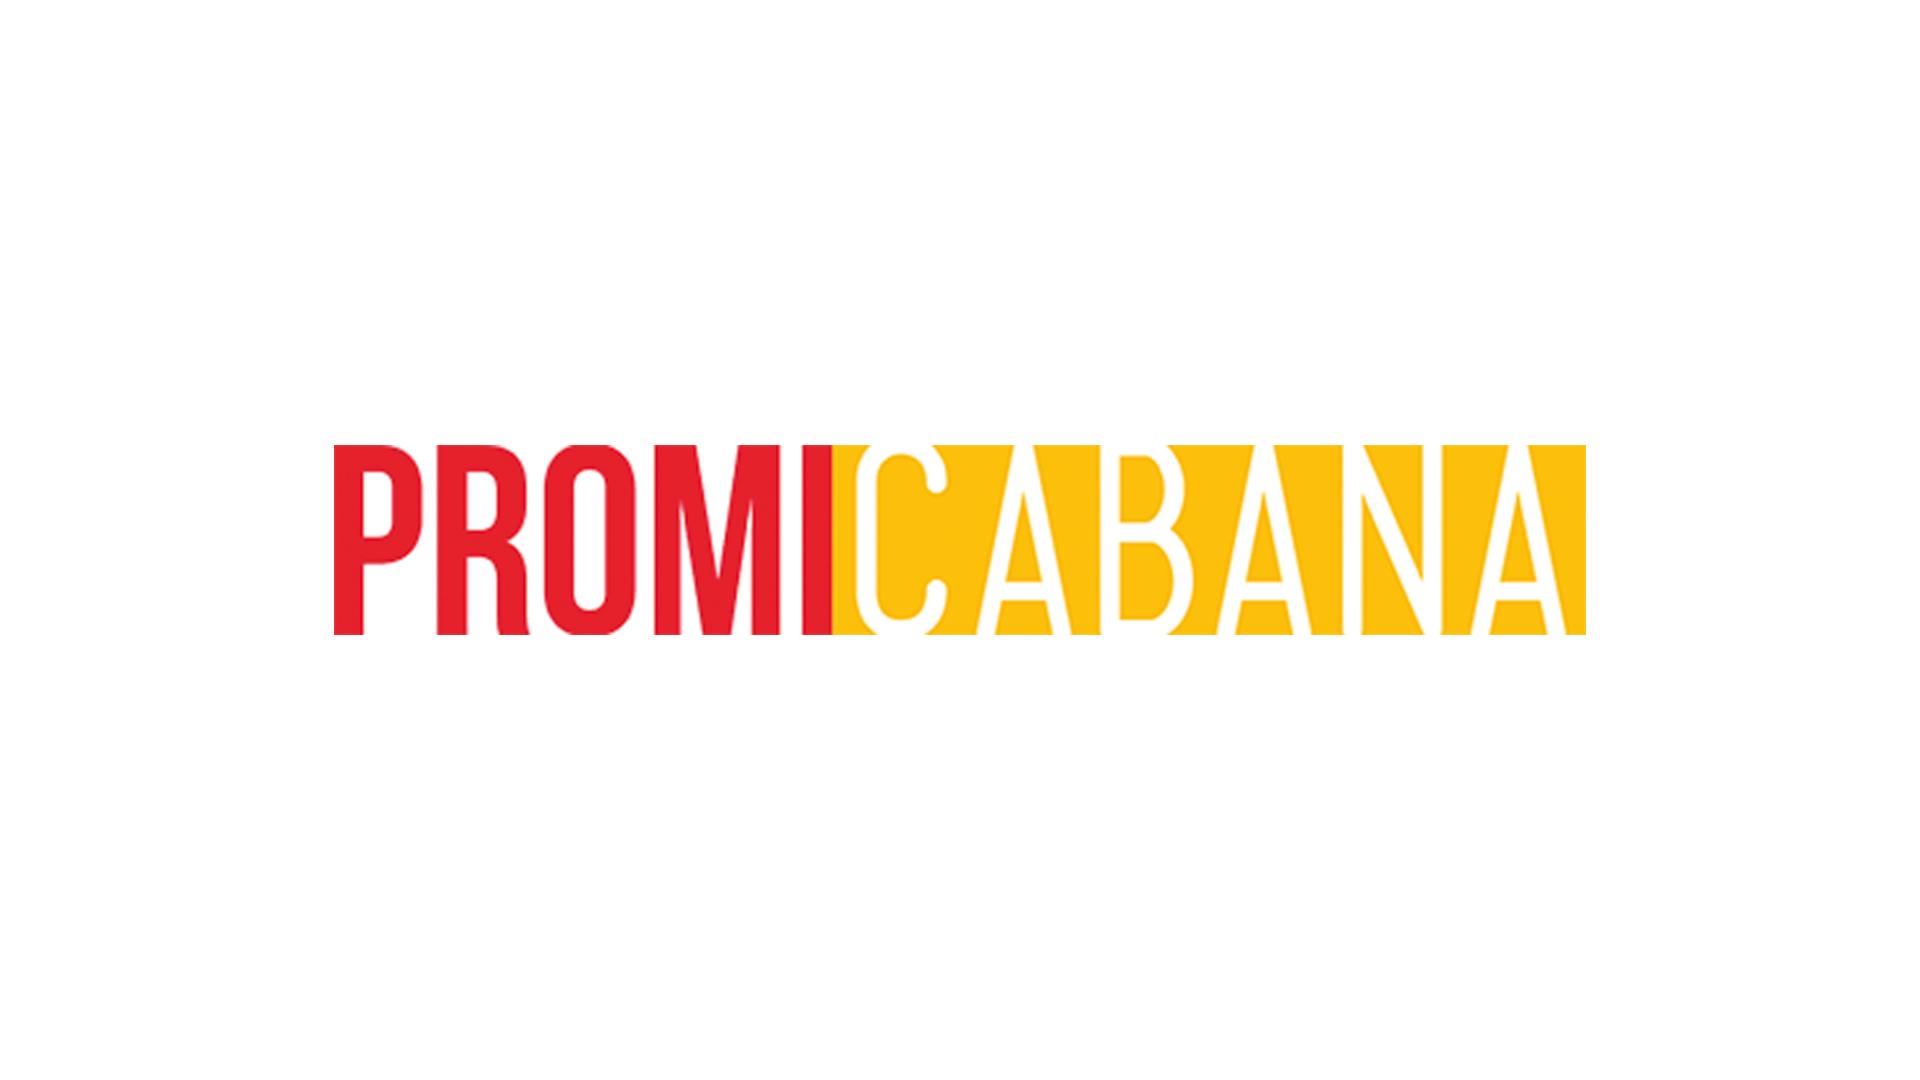 James-Franco-Kimmel-Twilight